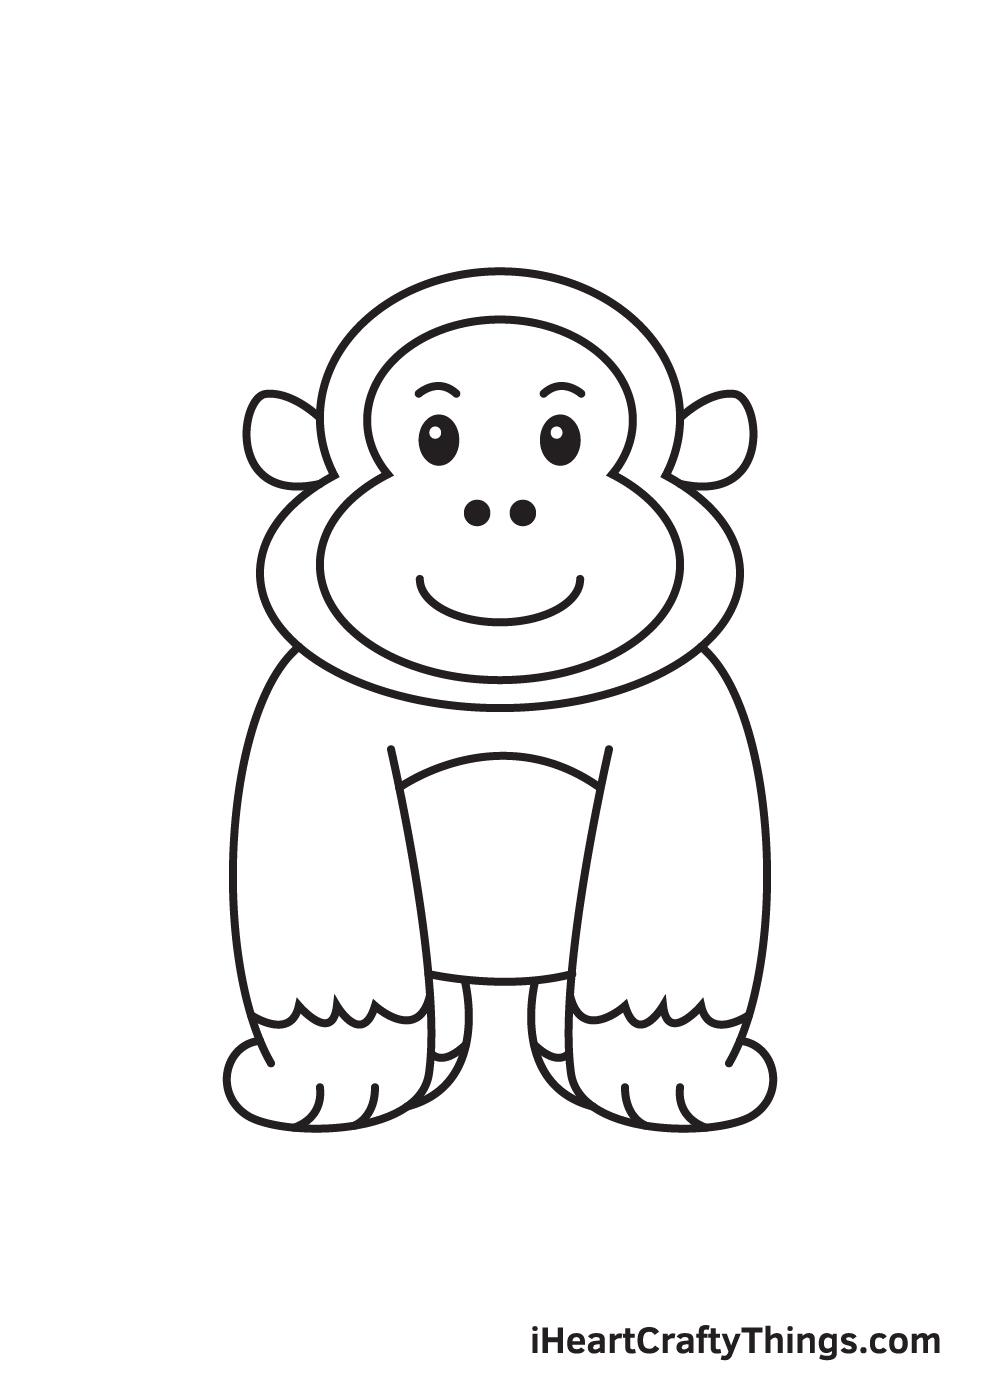 gorilla drawing - step 9